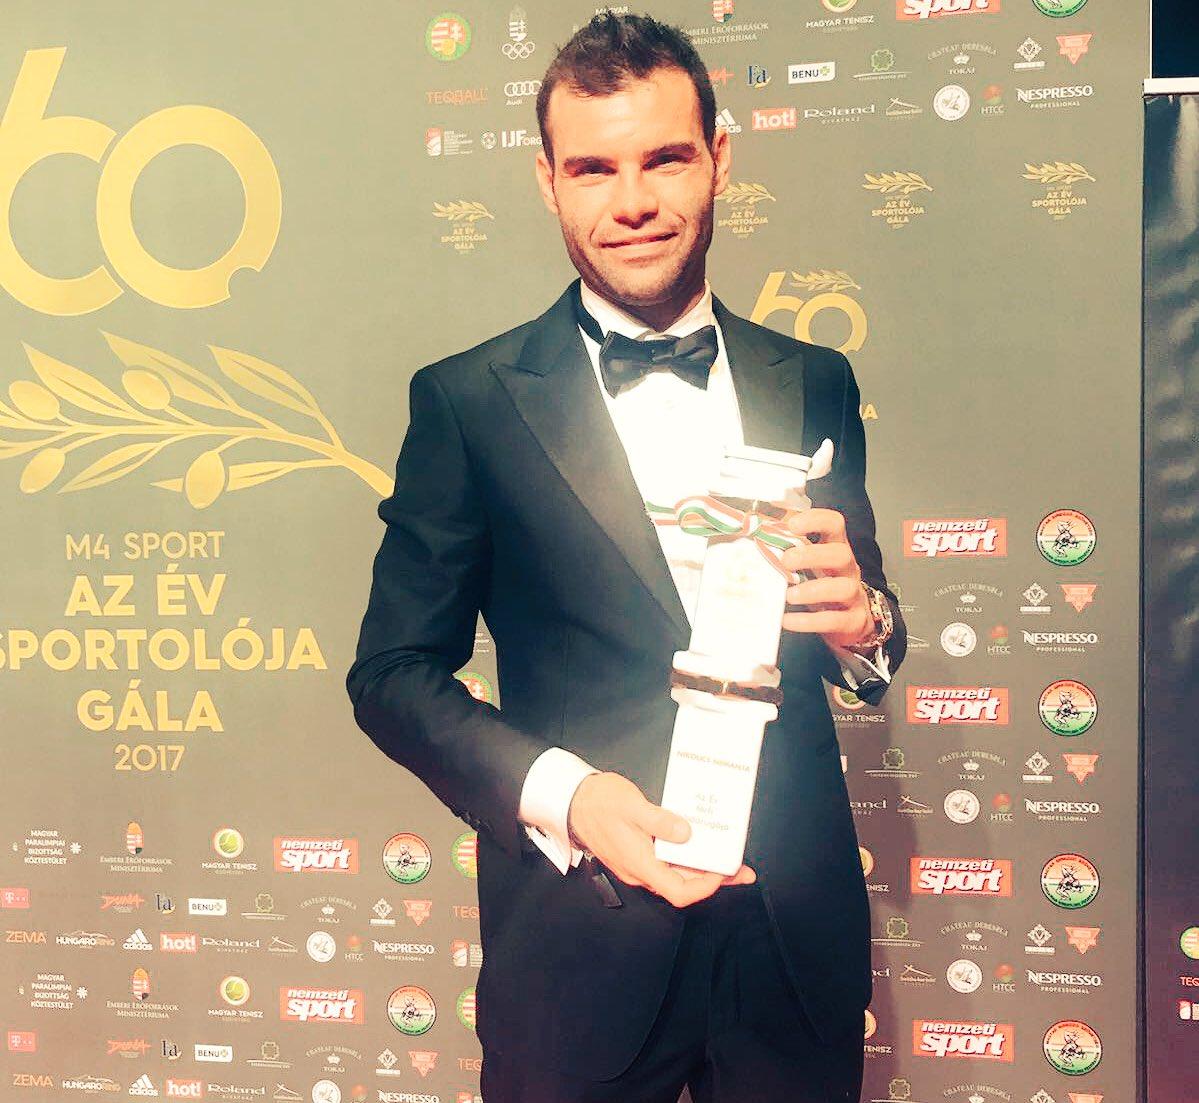 RT @niko_nemanja: With the award. 2017 best Hungarian football player. https://t.co/sJhAlAyEXn